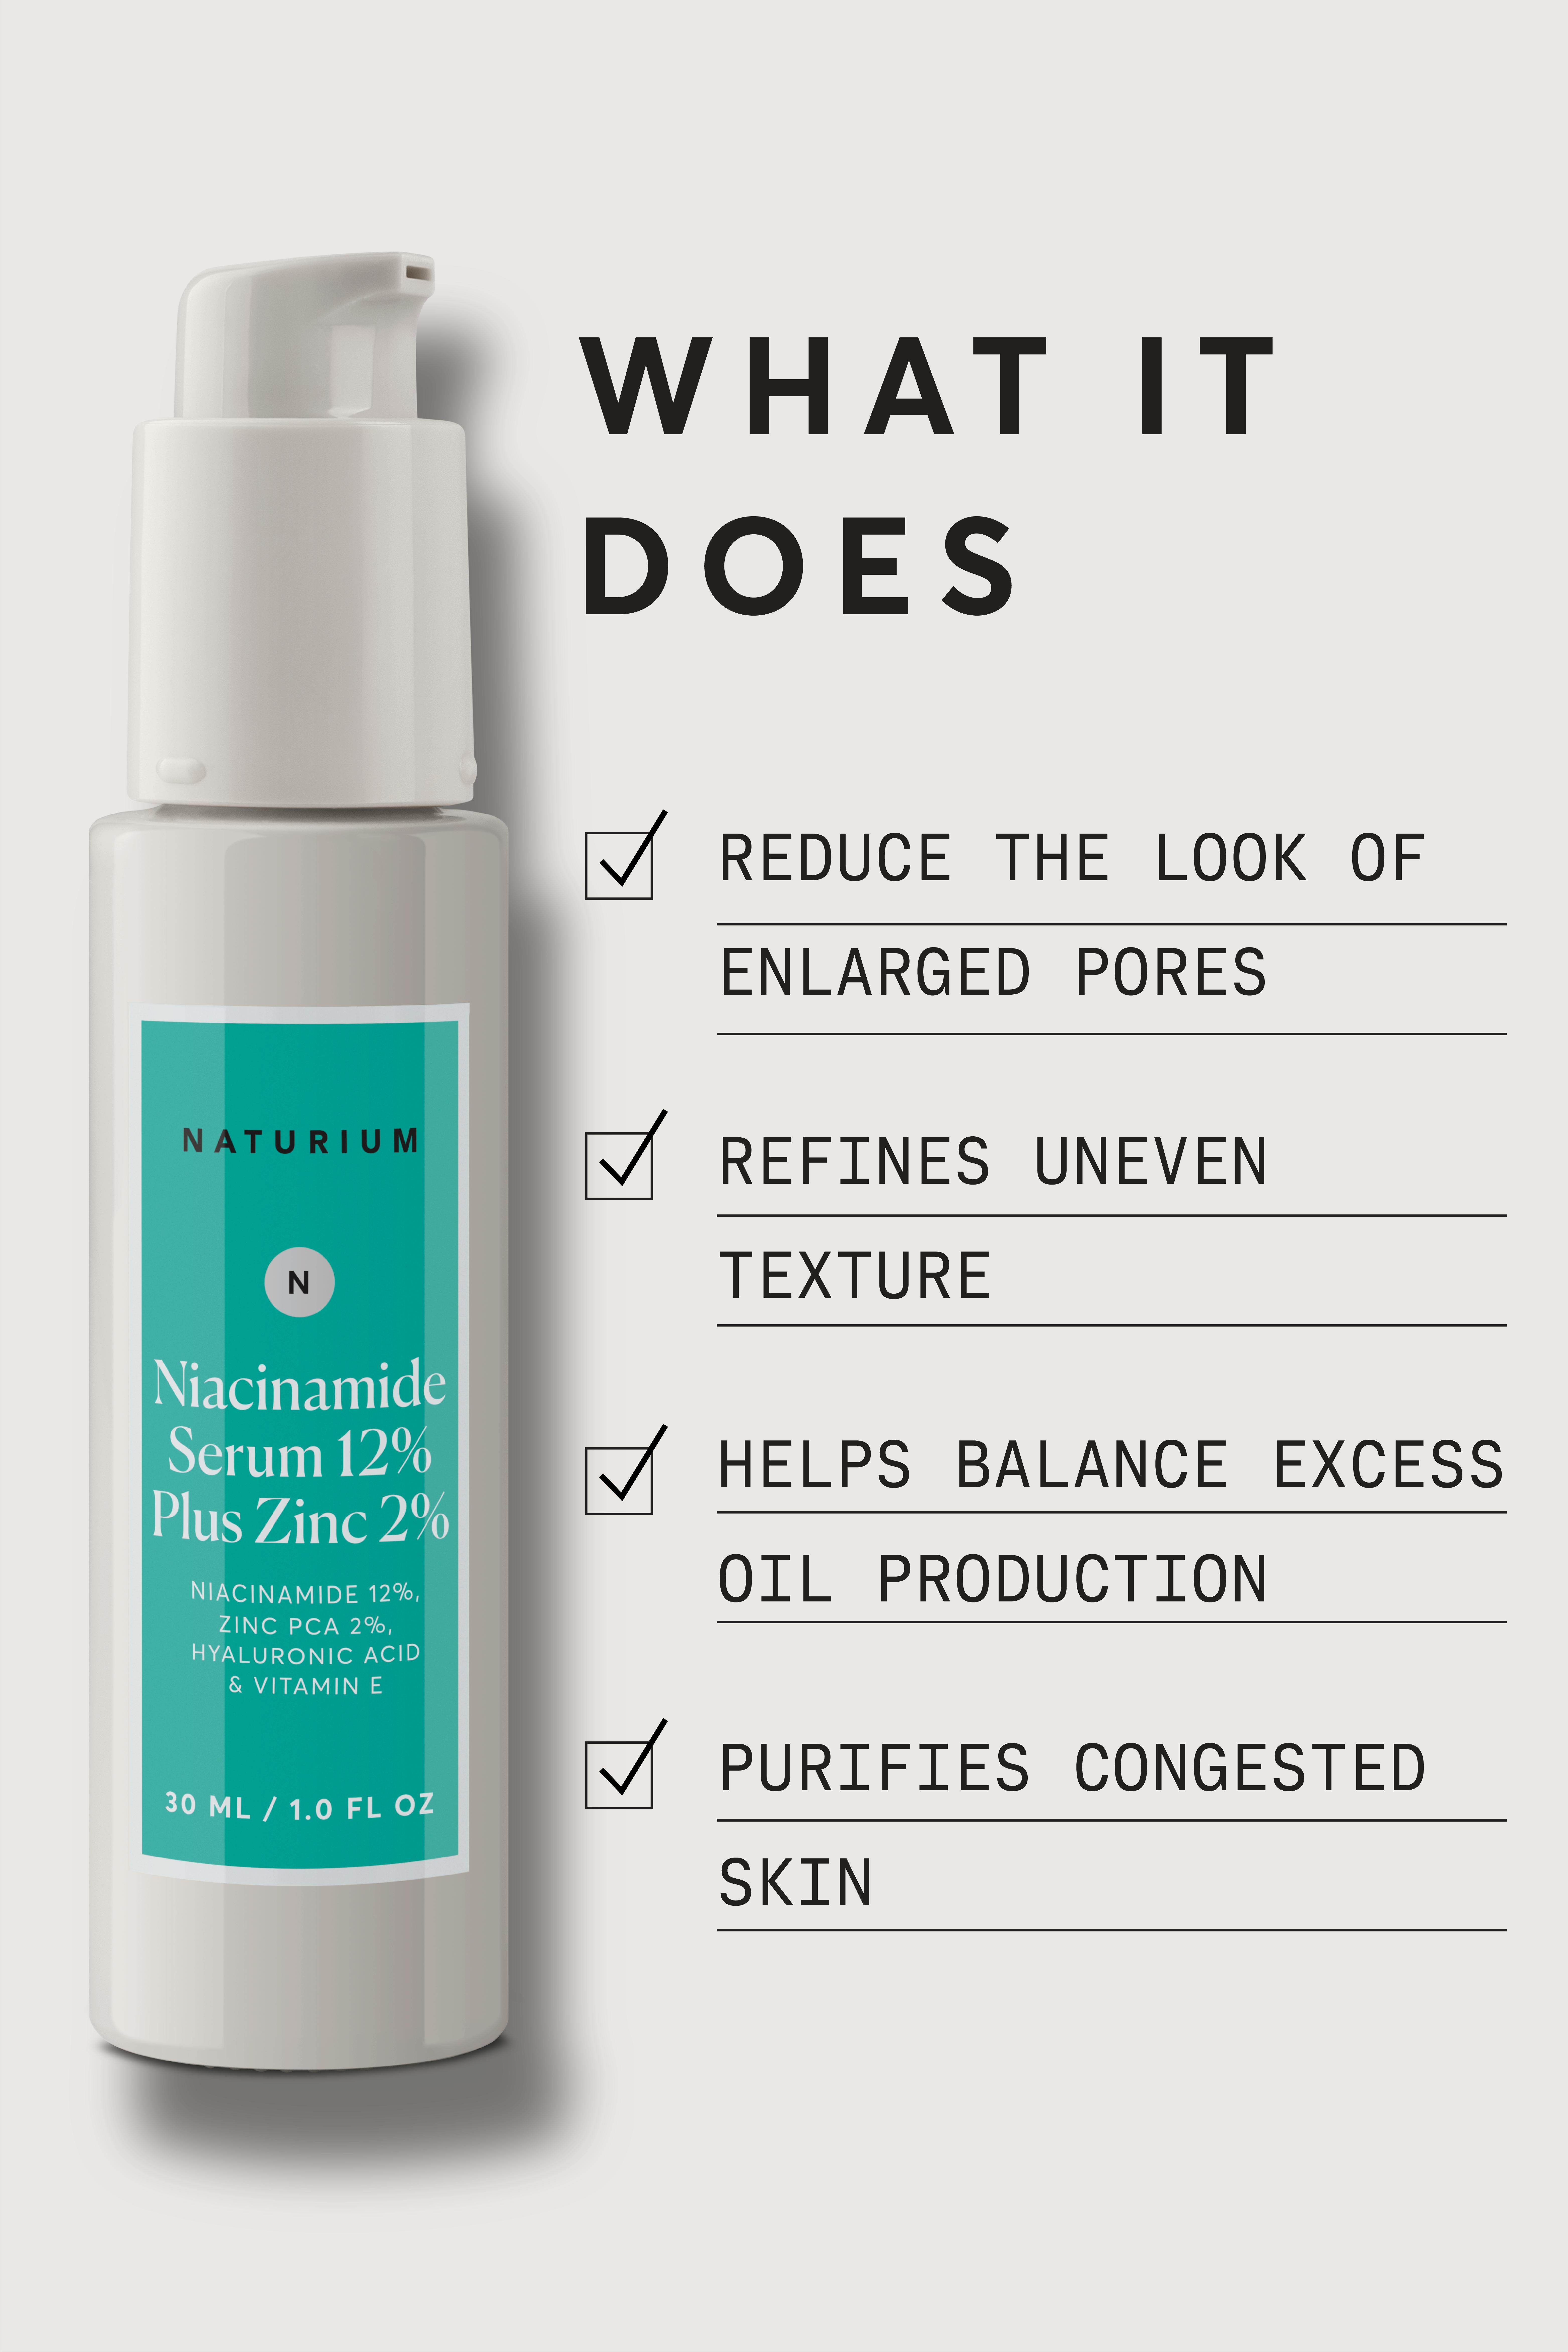 900 Skin Care Ideas In 2021 Skin Care Skin Beauty Skin Care